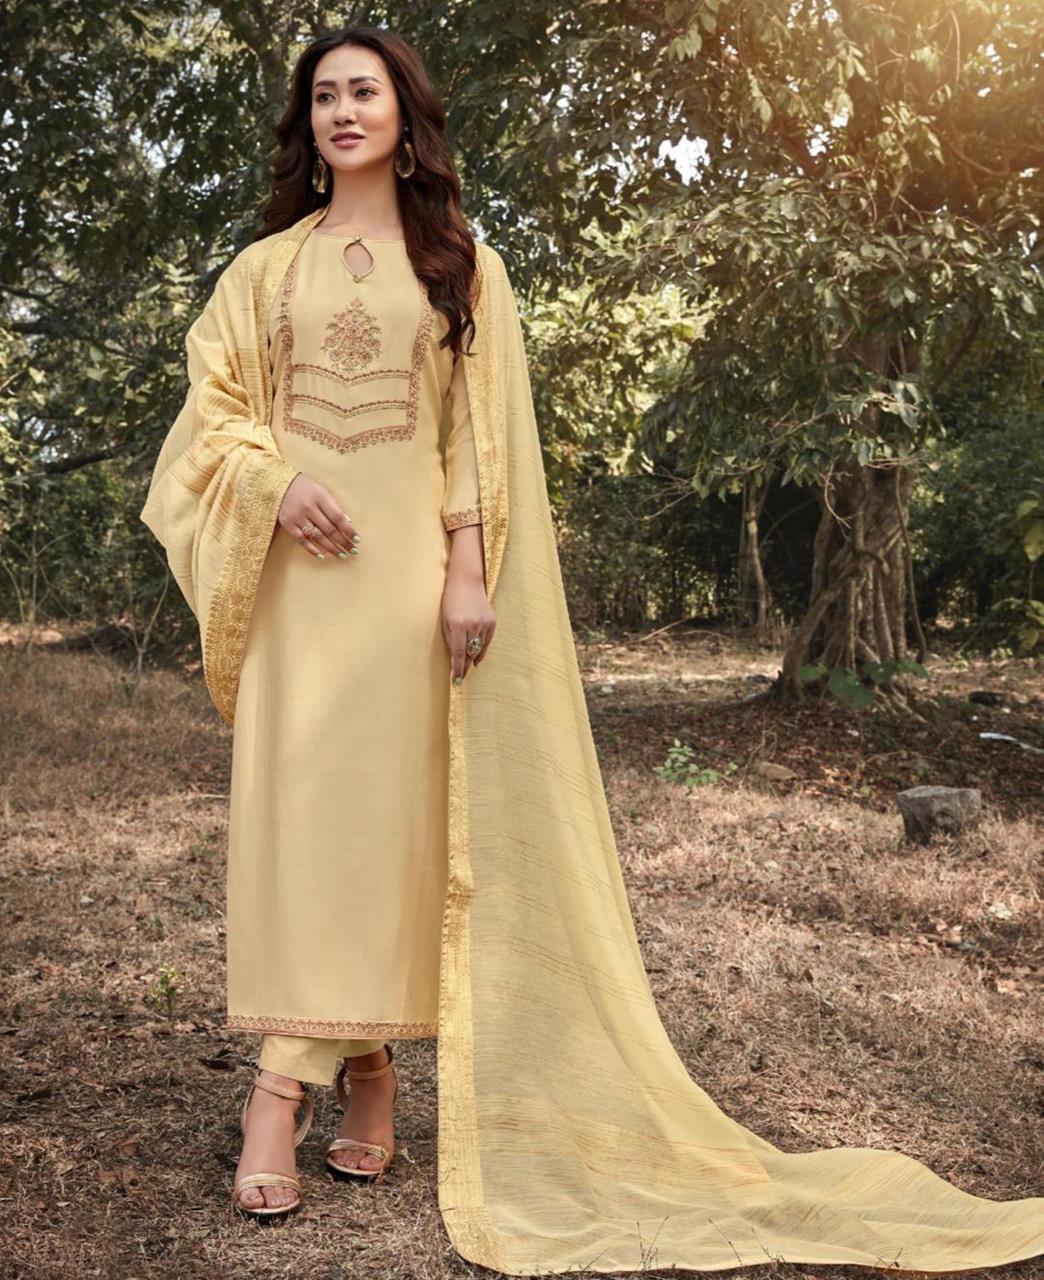 Zari Cotton Straight cut Salwar Kameez in Cream